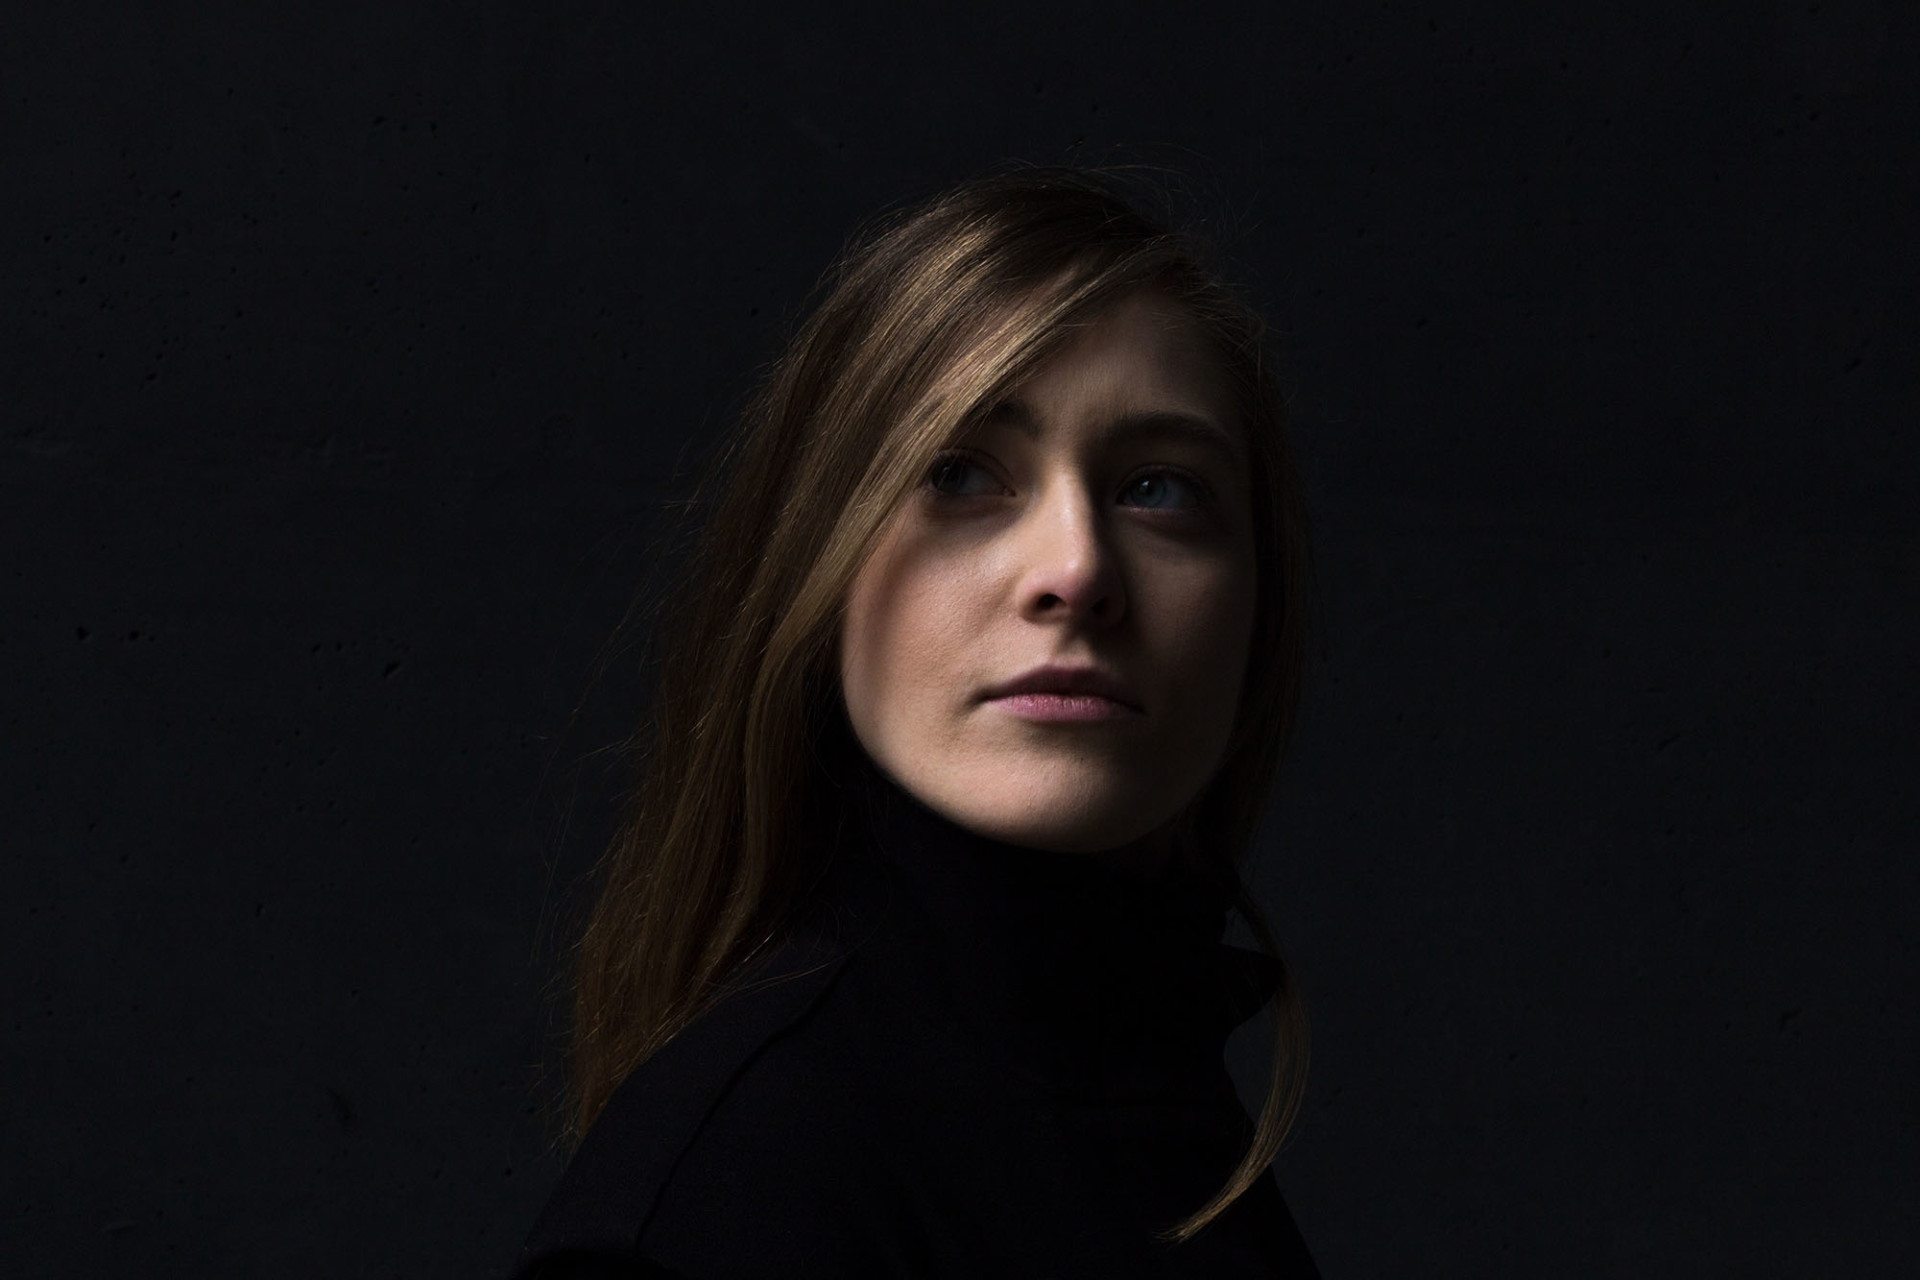 Marcus Glahn Portraits